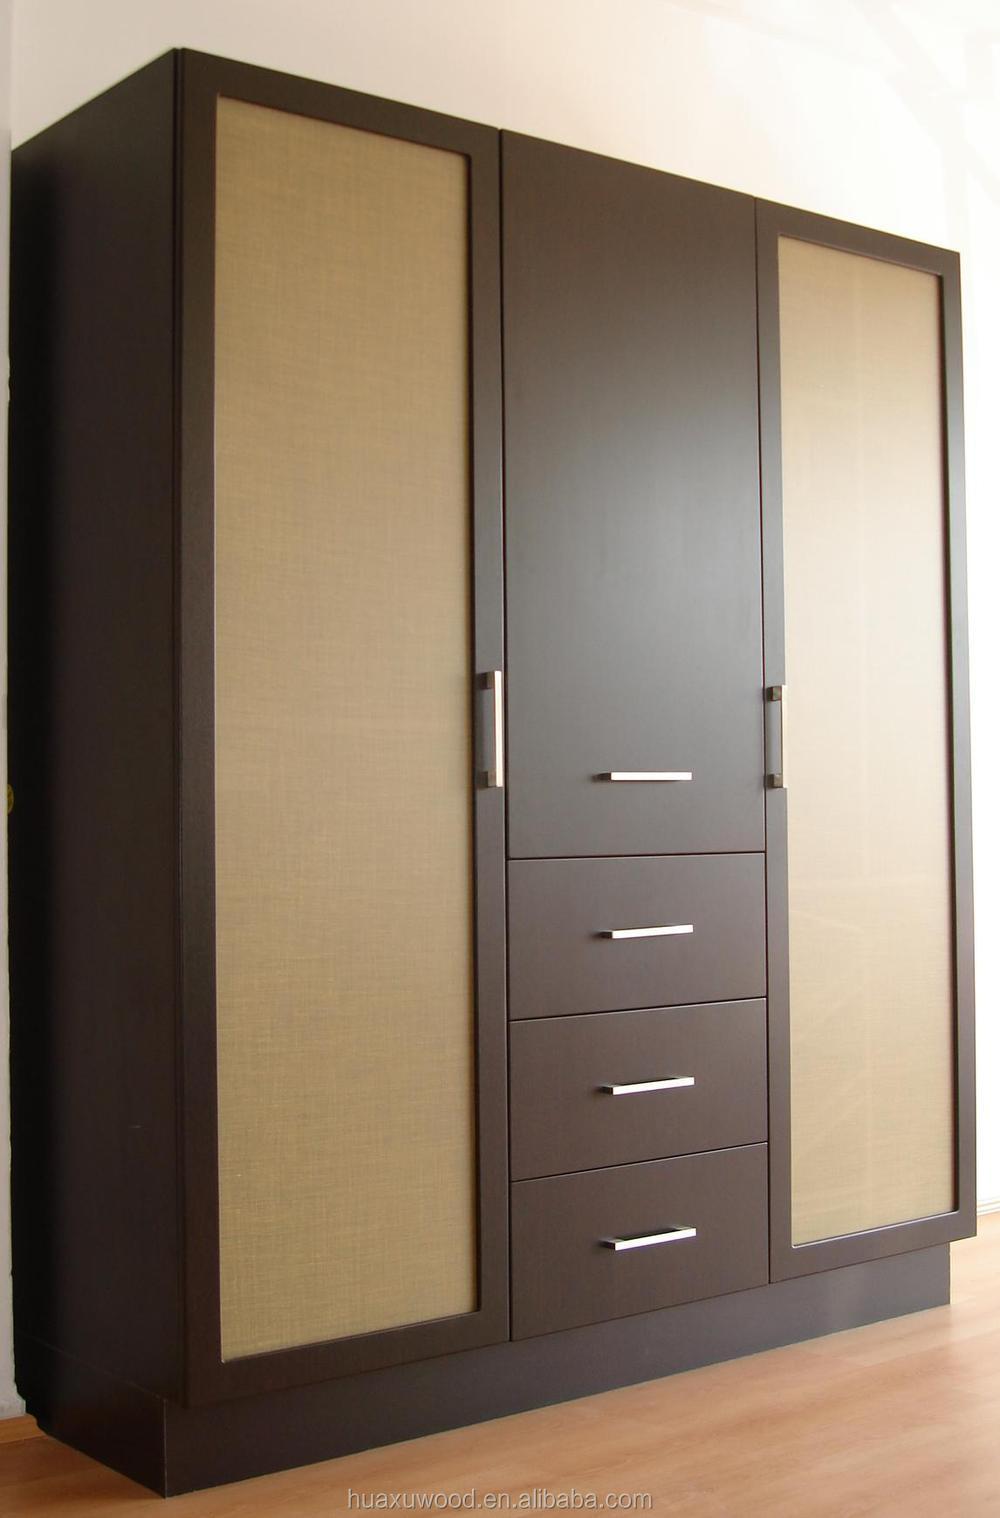 Muebles dormitorio diseo muebles de melamine dormitorio for Mueble zapatero hipercor